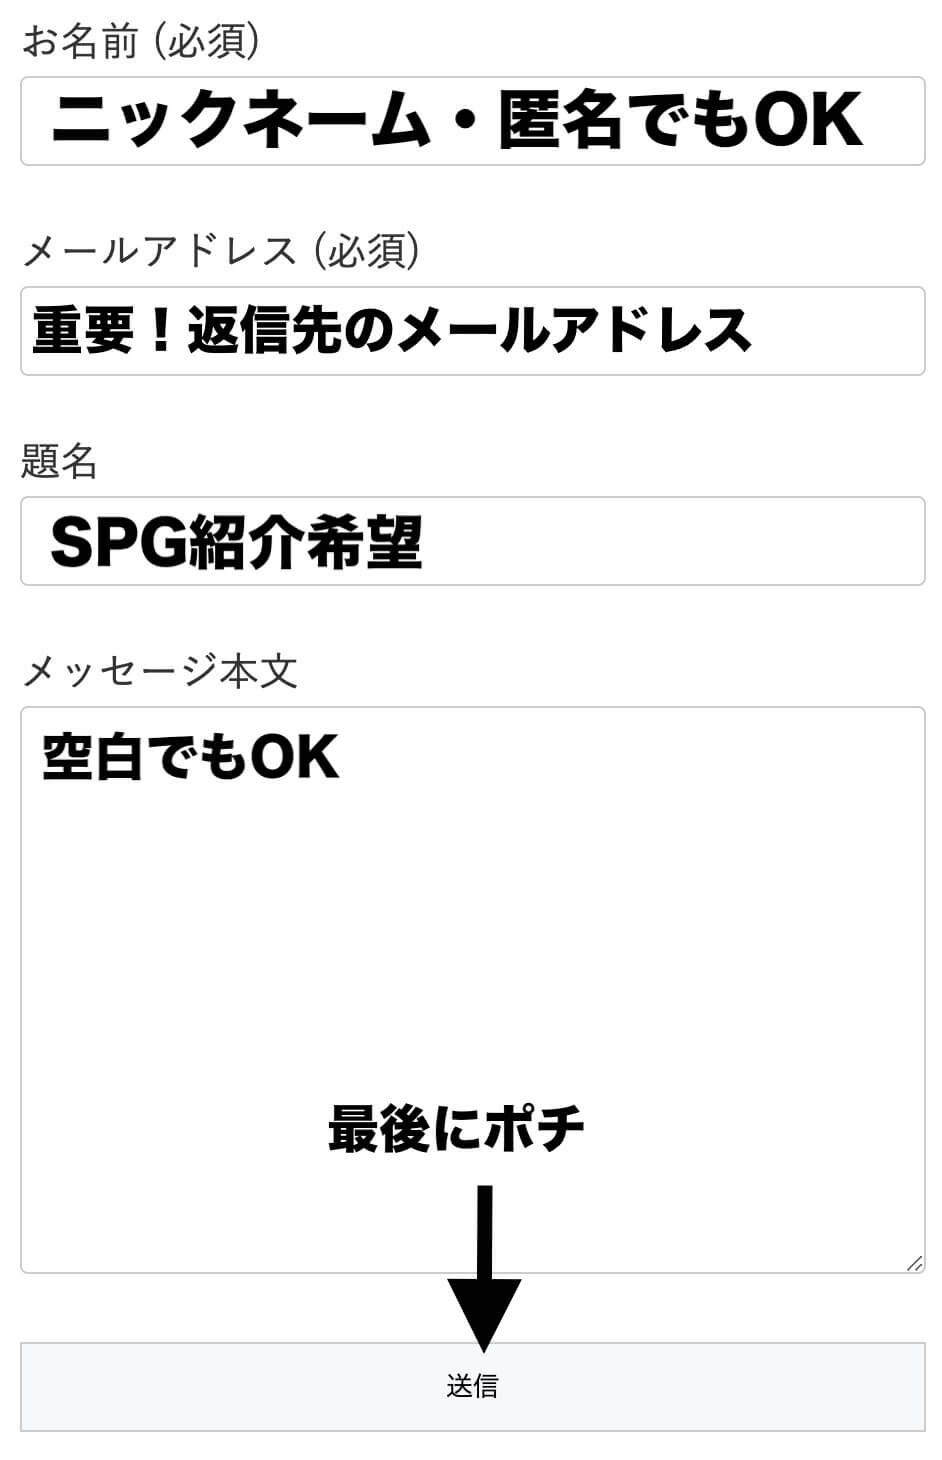 SPGアメックス問い合わせ記入例